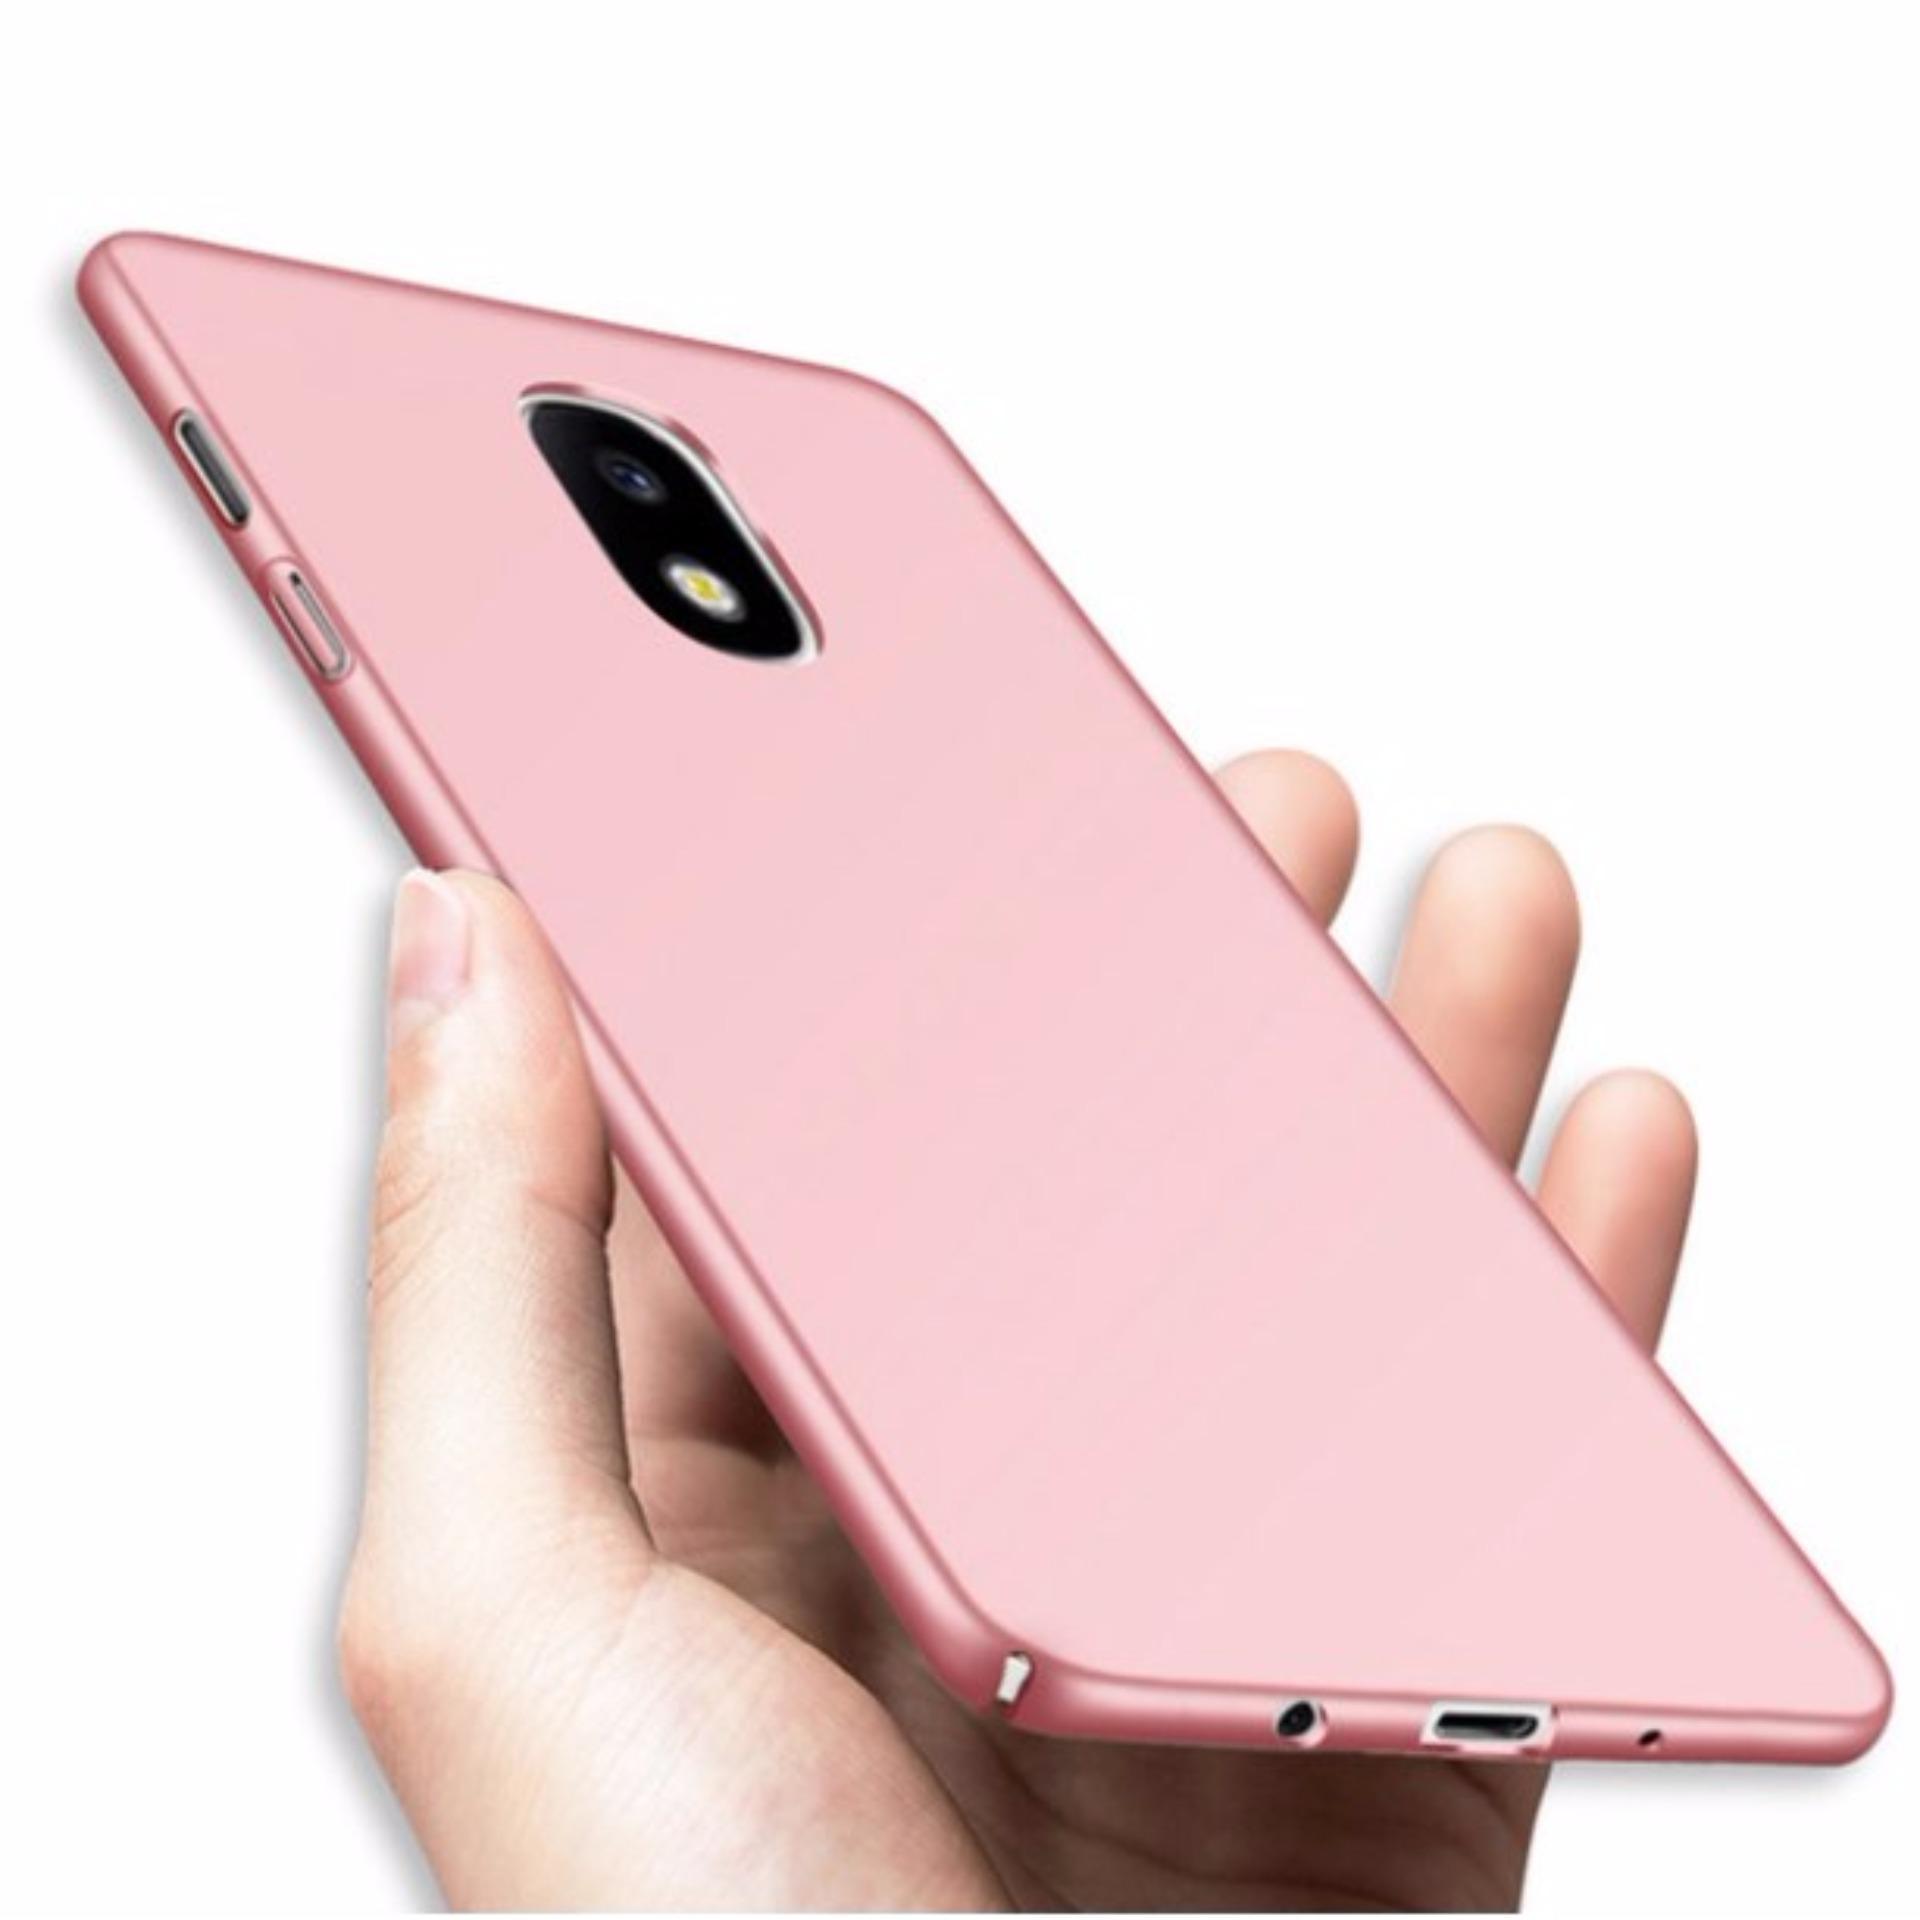 Jual Gsu Samsung J7 Pro J7 2017 Baby Skin Ultra Thin Slim Matte Hard Case Gsu Online